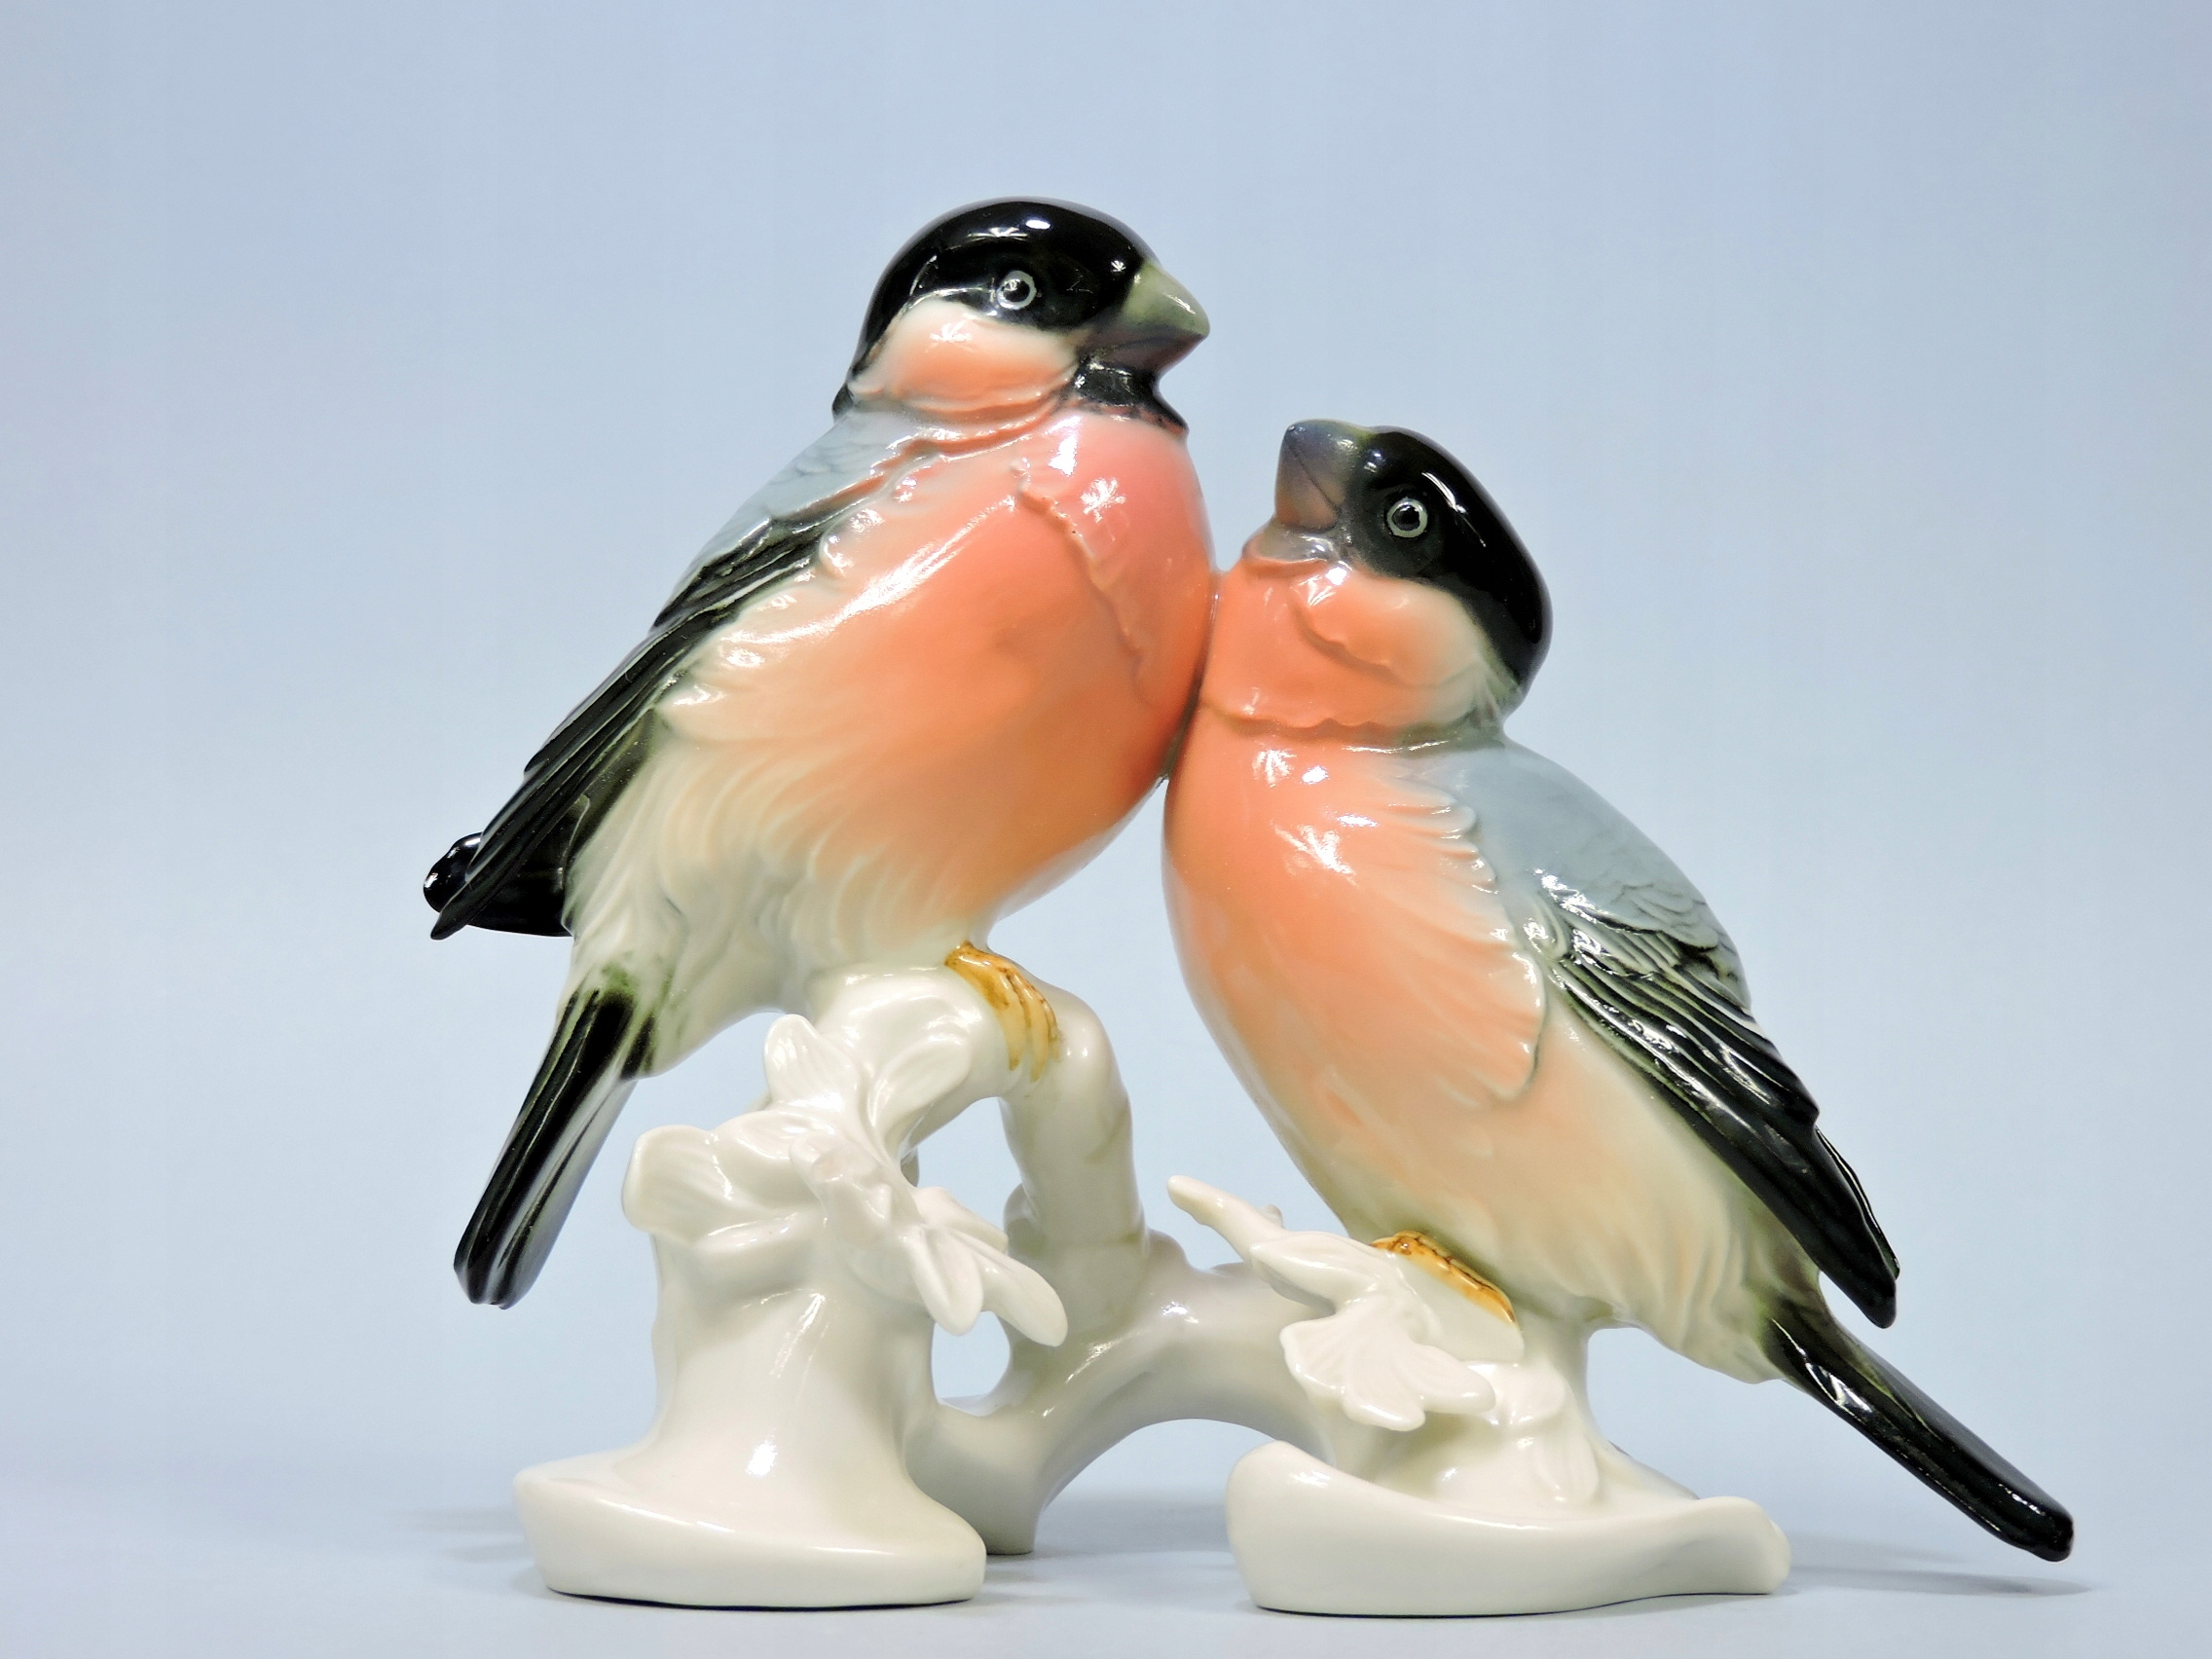 Figurka Ptak Gil 2 Gile Ens 6818 Antyk 1920 30 7355028058